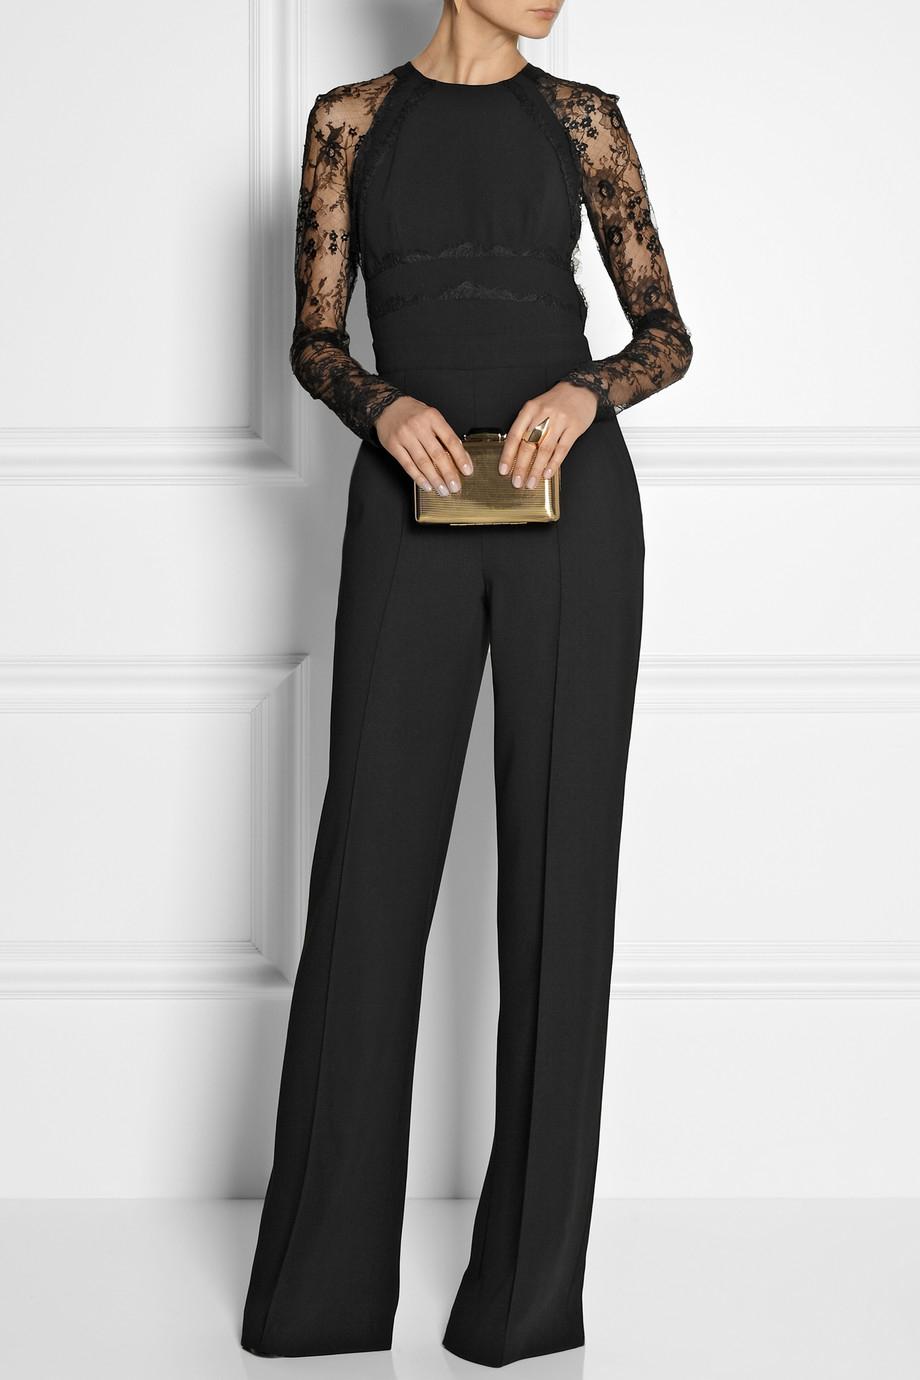 Lyst Elie Saab Paneled Lace And Crepe Jumpsuit In Black